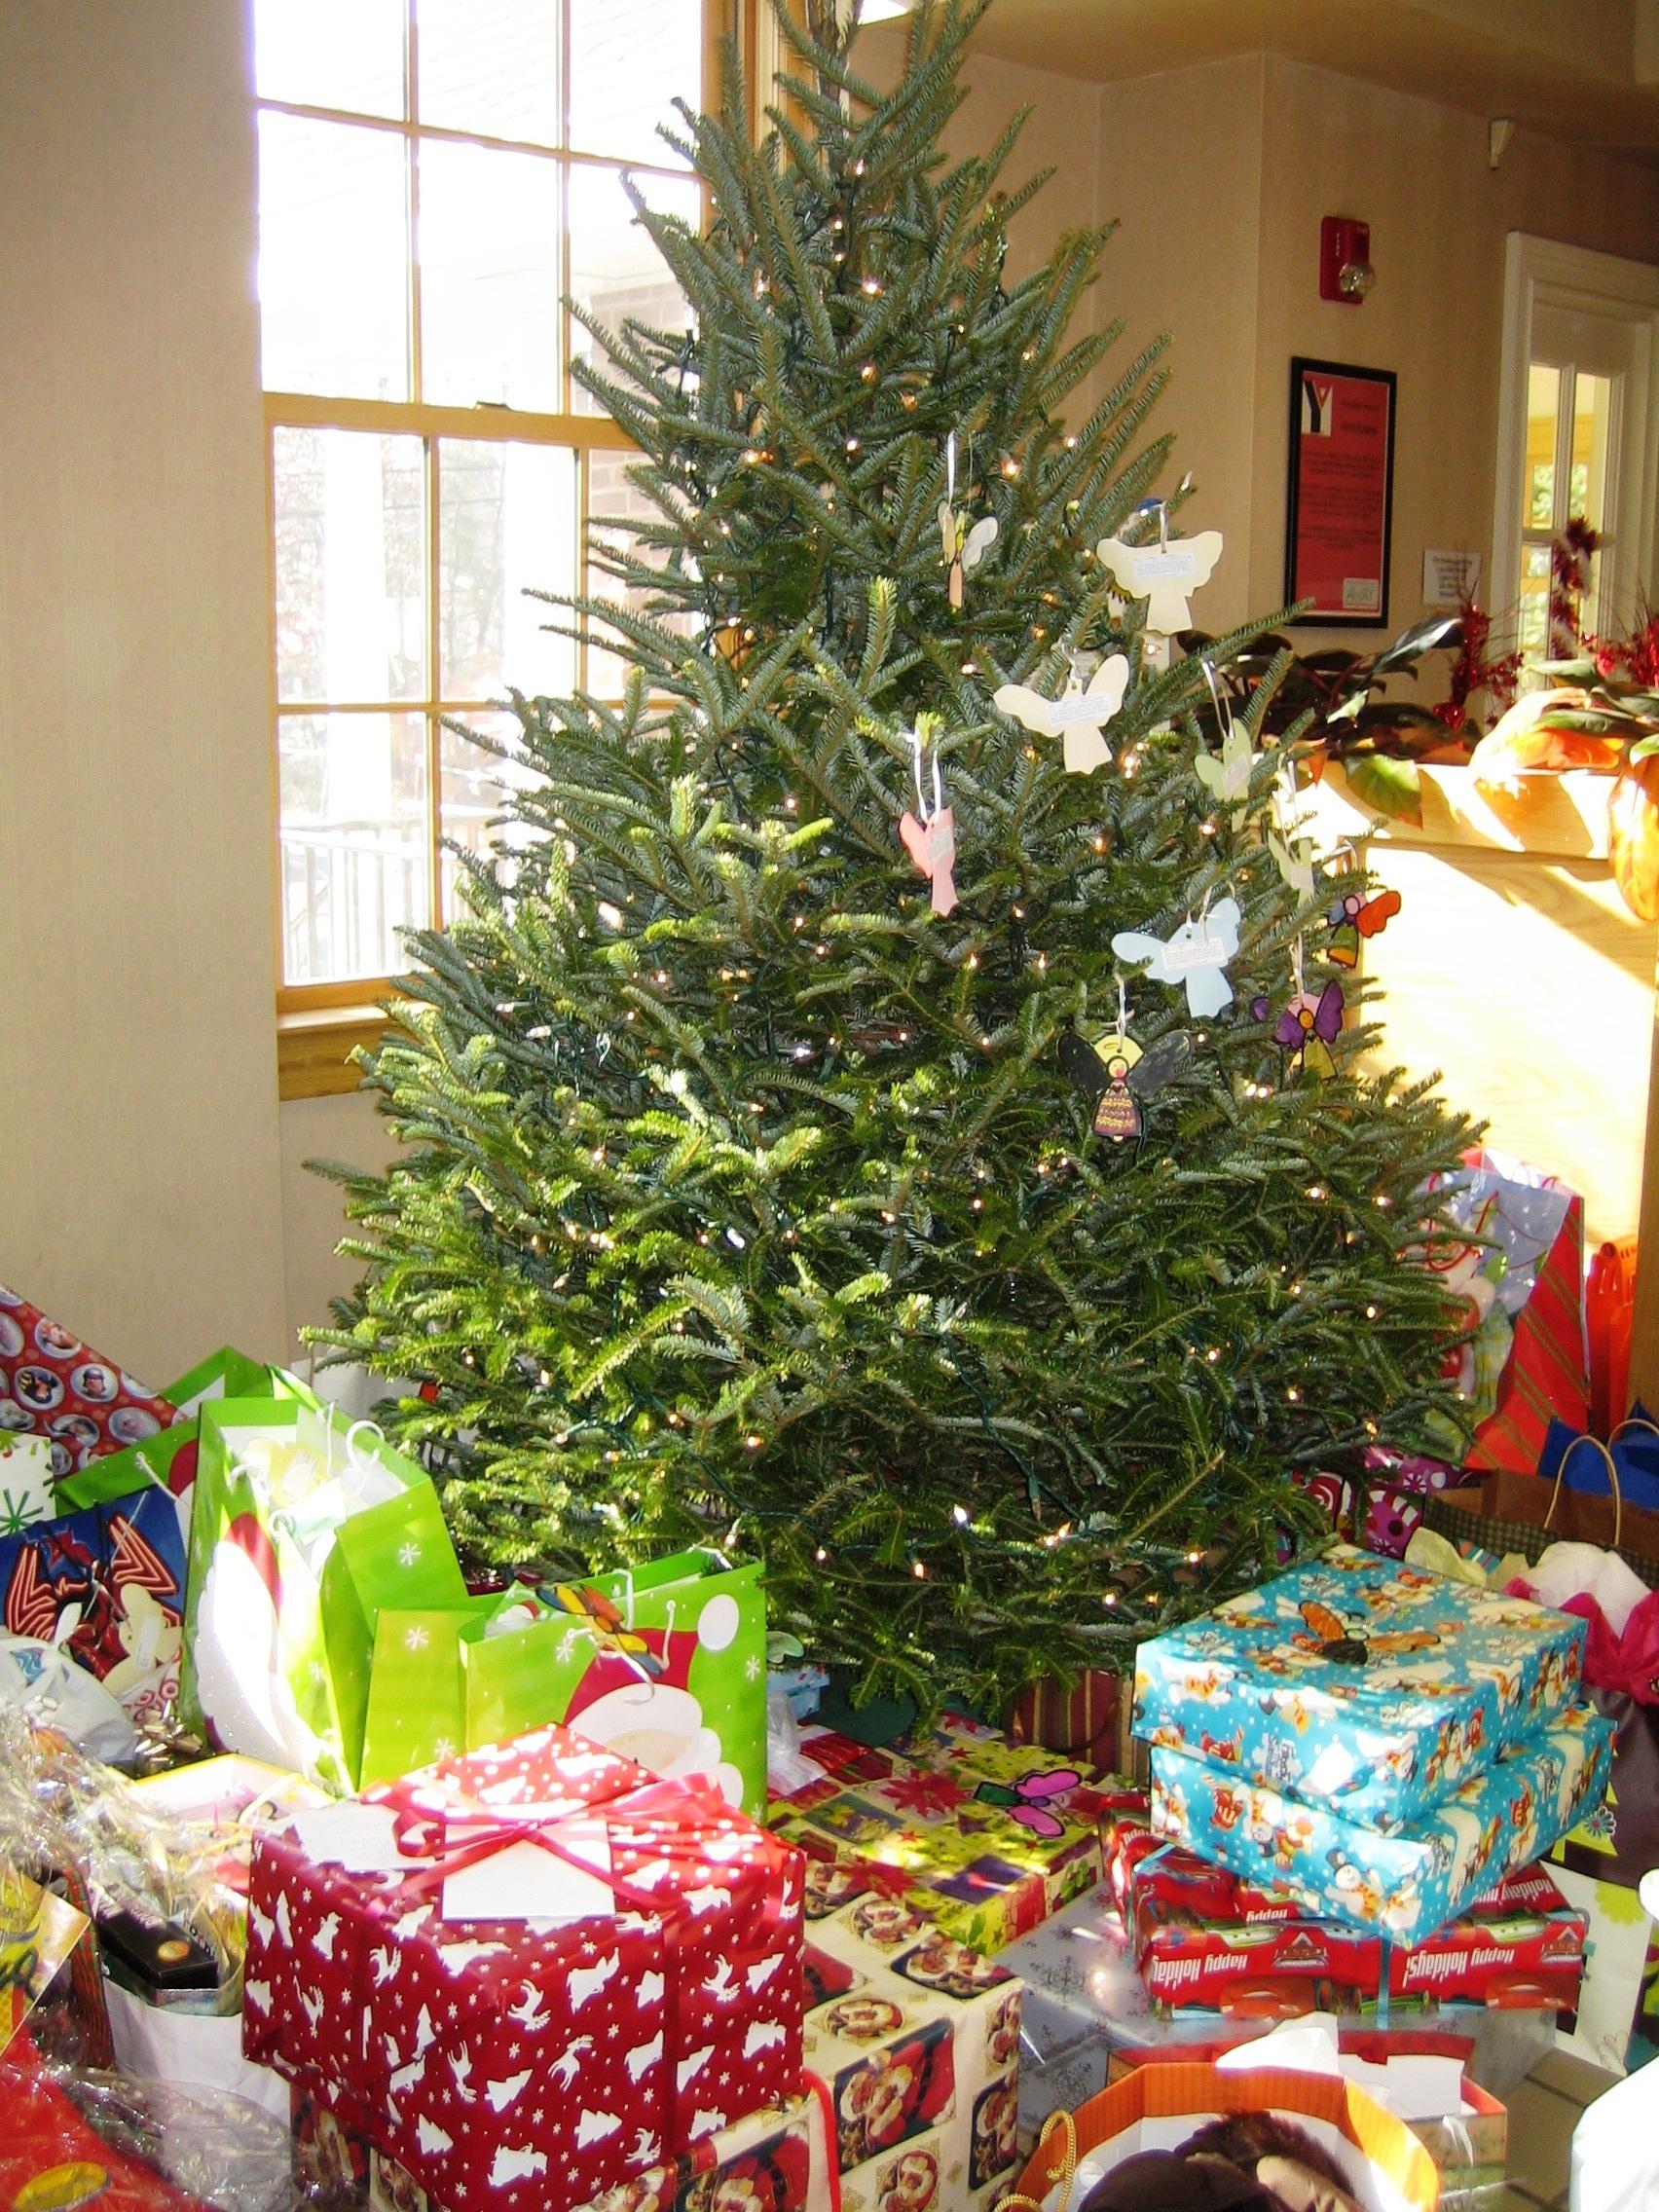 424753b20904663b6fbb_ANGEL_TREE_PHOTO_for_JAN_2011_Release.jpg